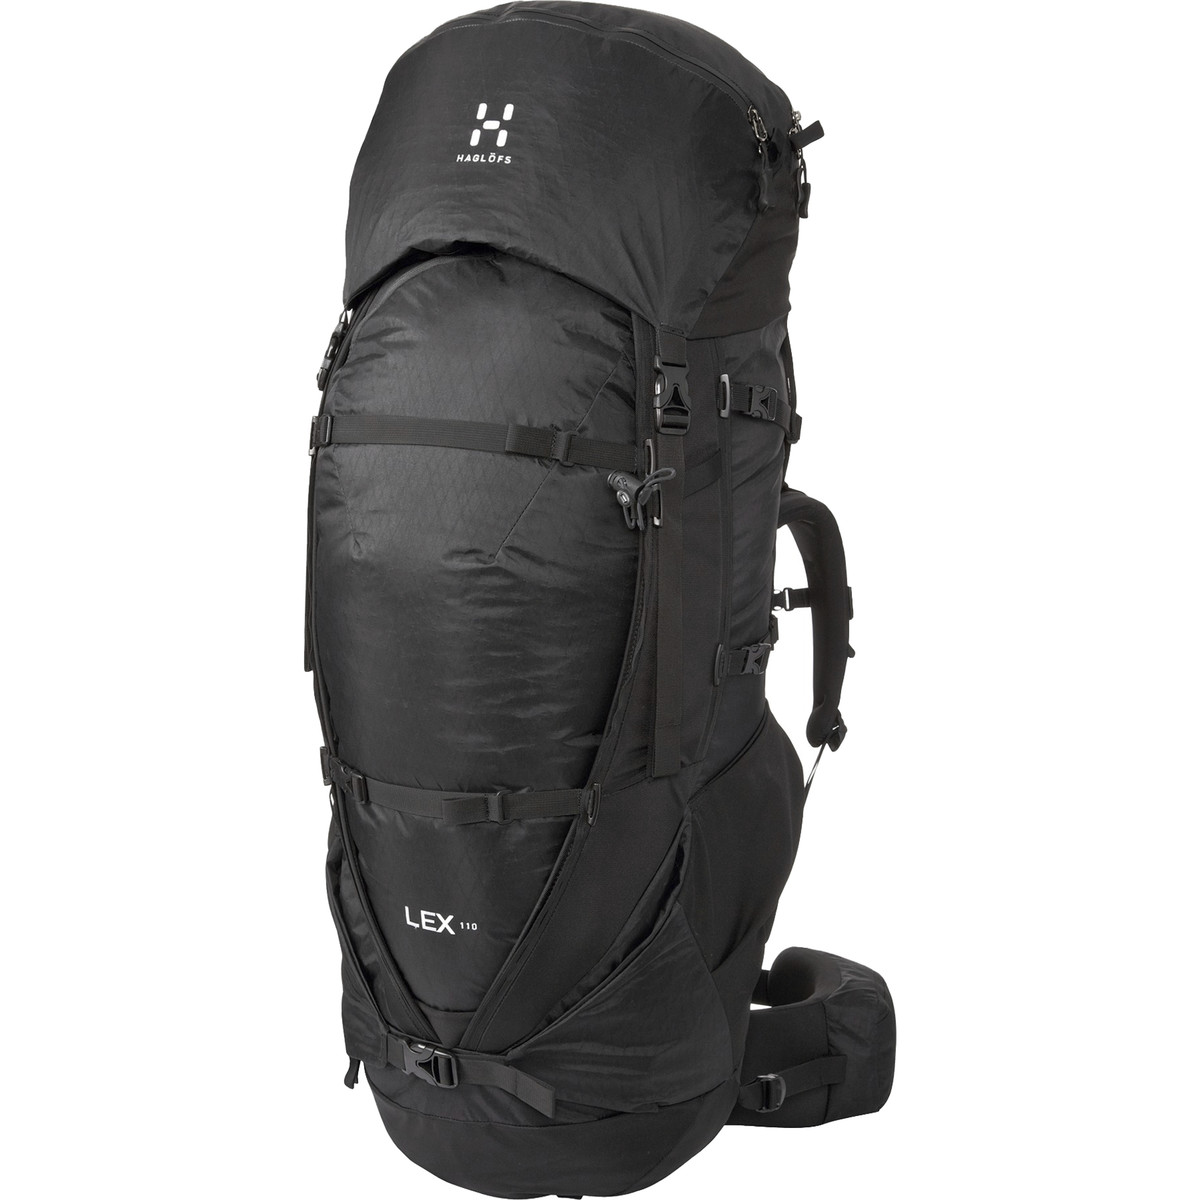 photo: Haglofs Lex 110 expedition pack (70l+)